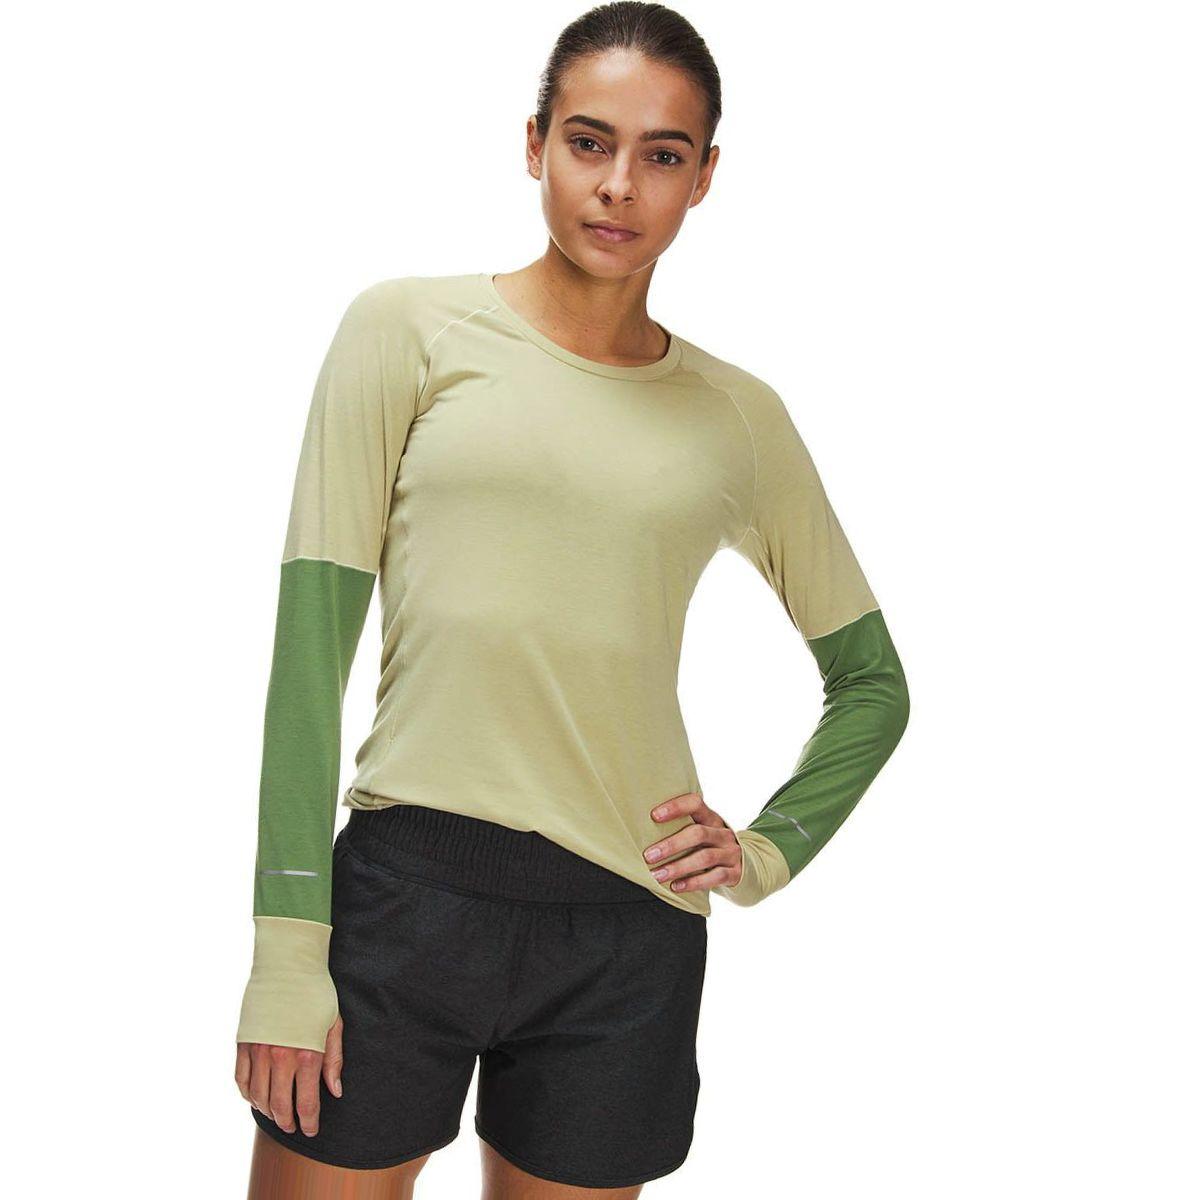 Backcountry La Sal Long-Sleeve Active T-Shirt